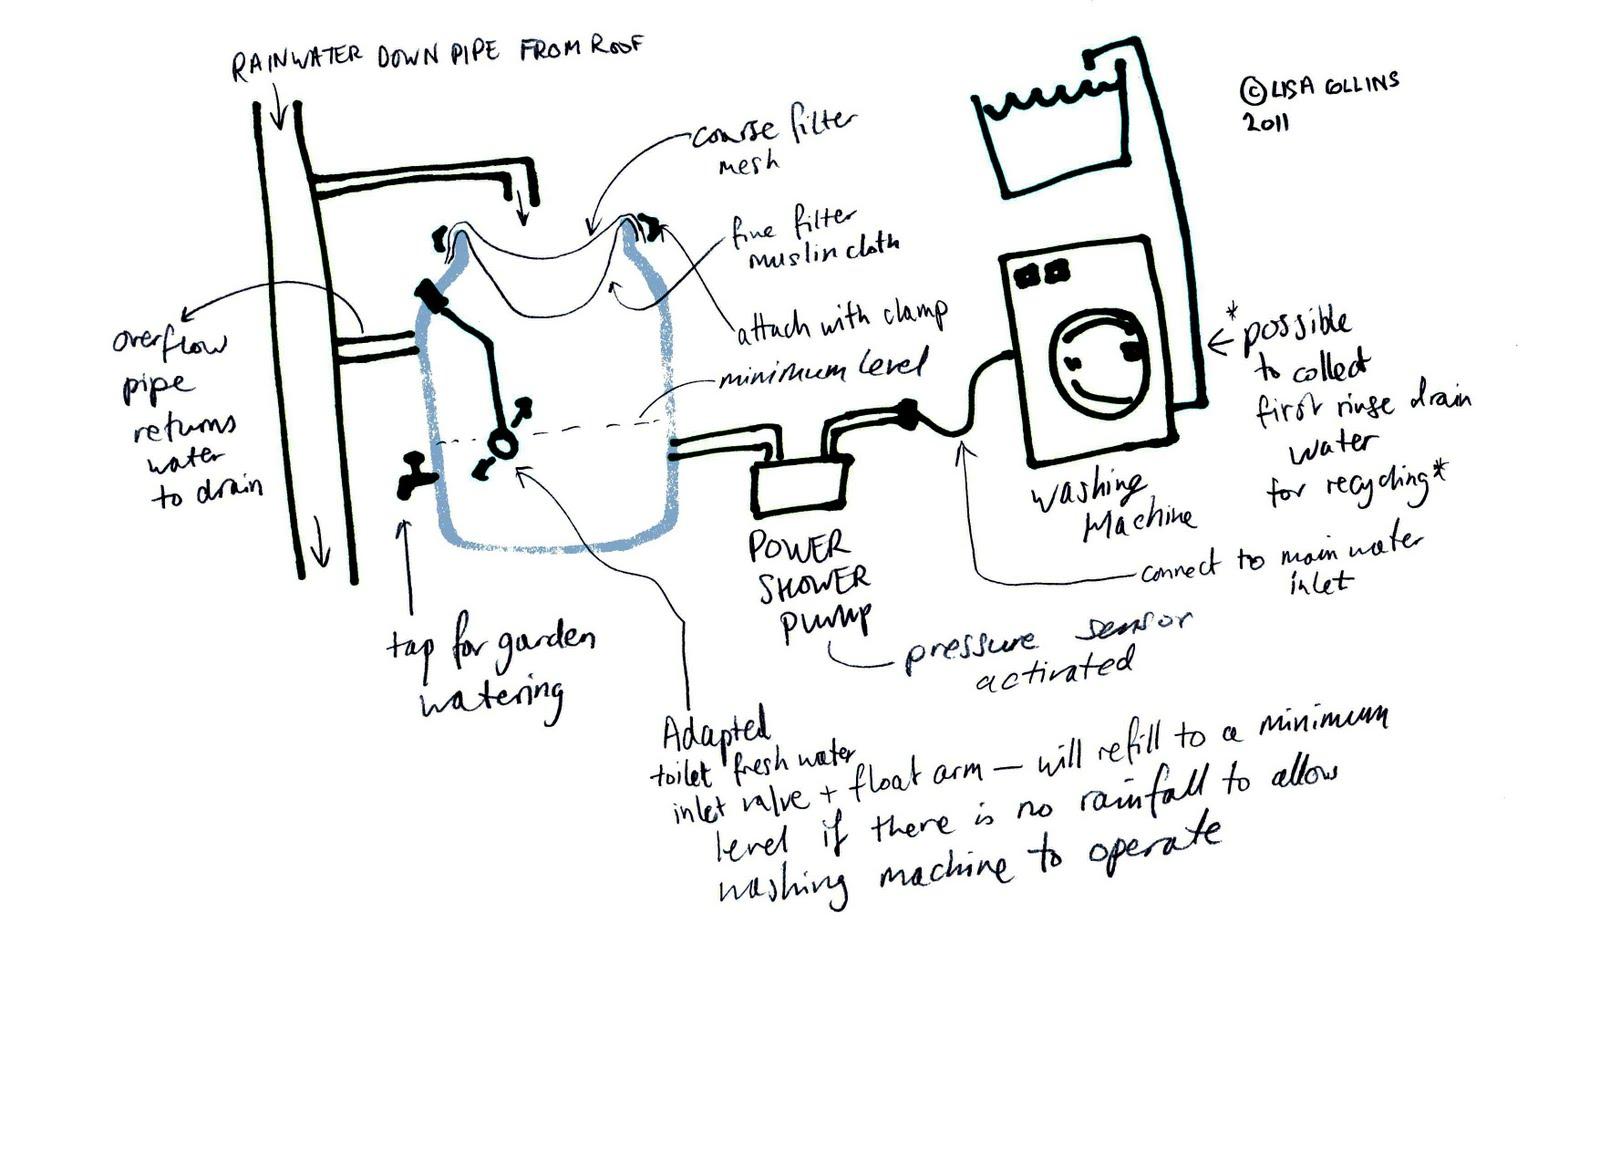 Water Aware: A homemade rainwater harvesting system